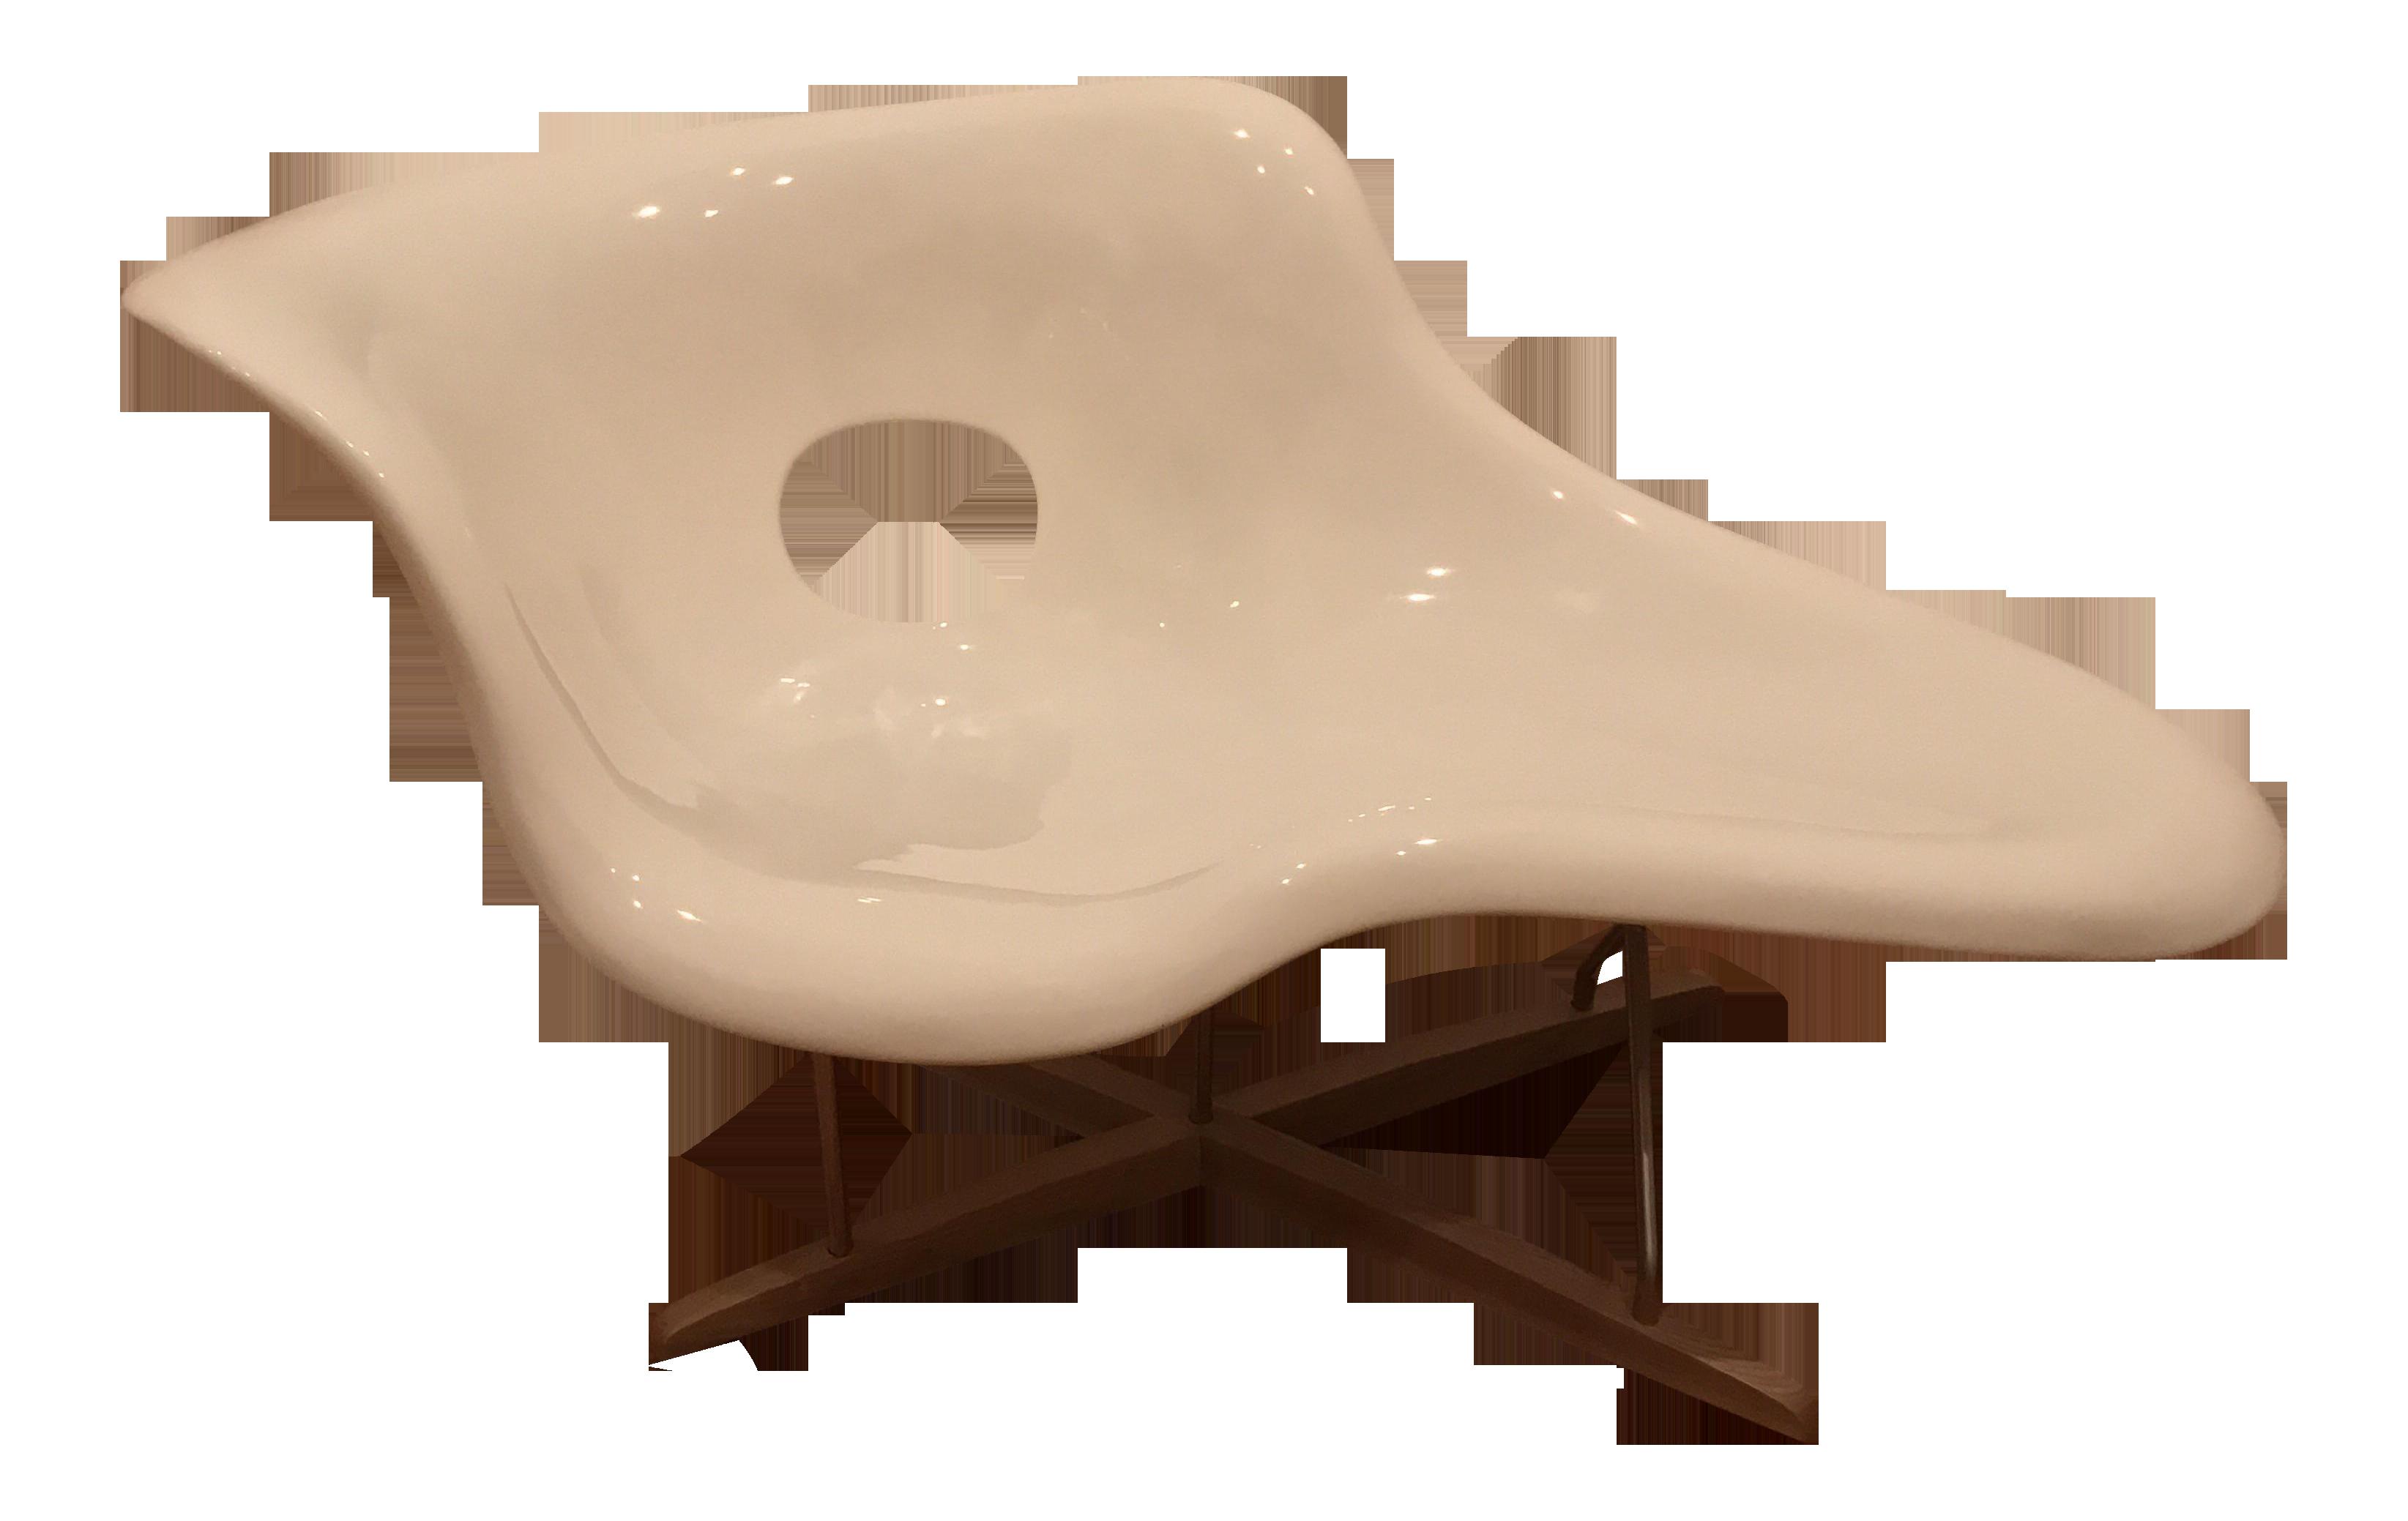 eames la chaise white lounge chair chairish. Black Bedroom Furniture Sets. Home Design Ideas